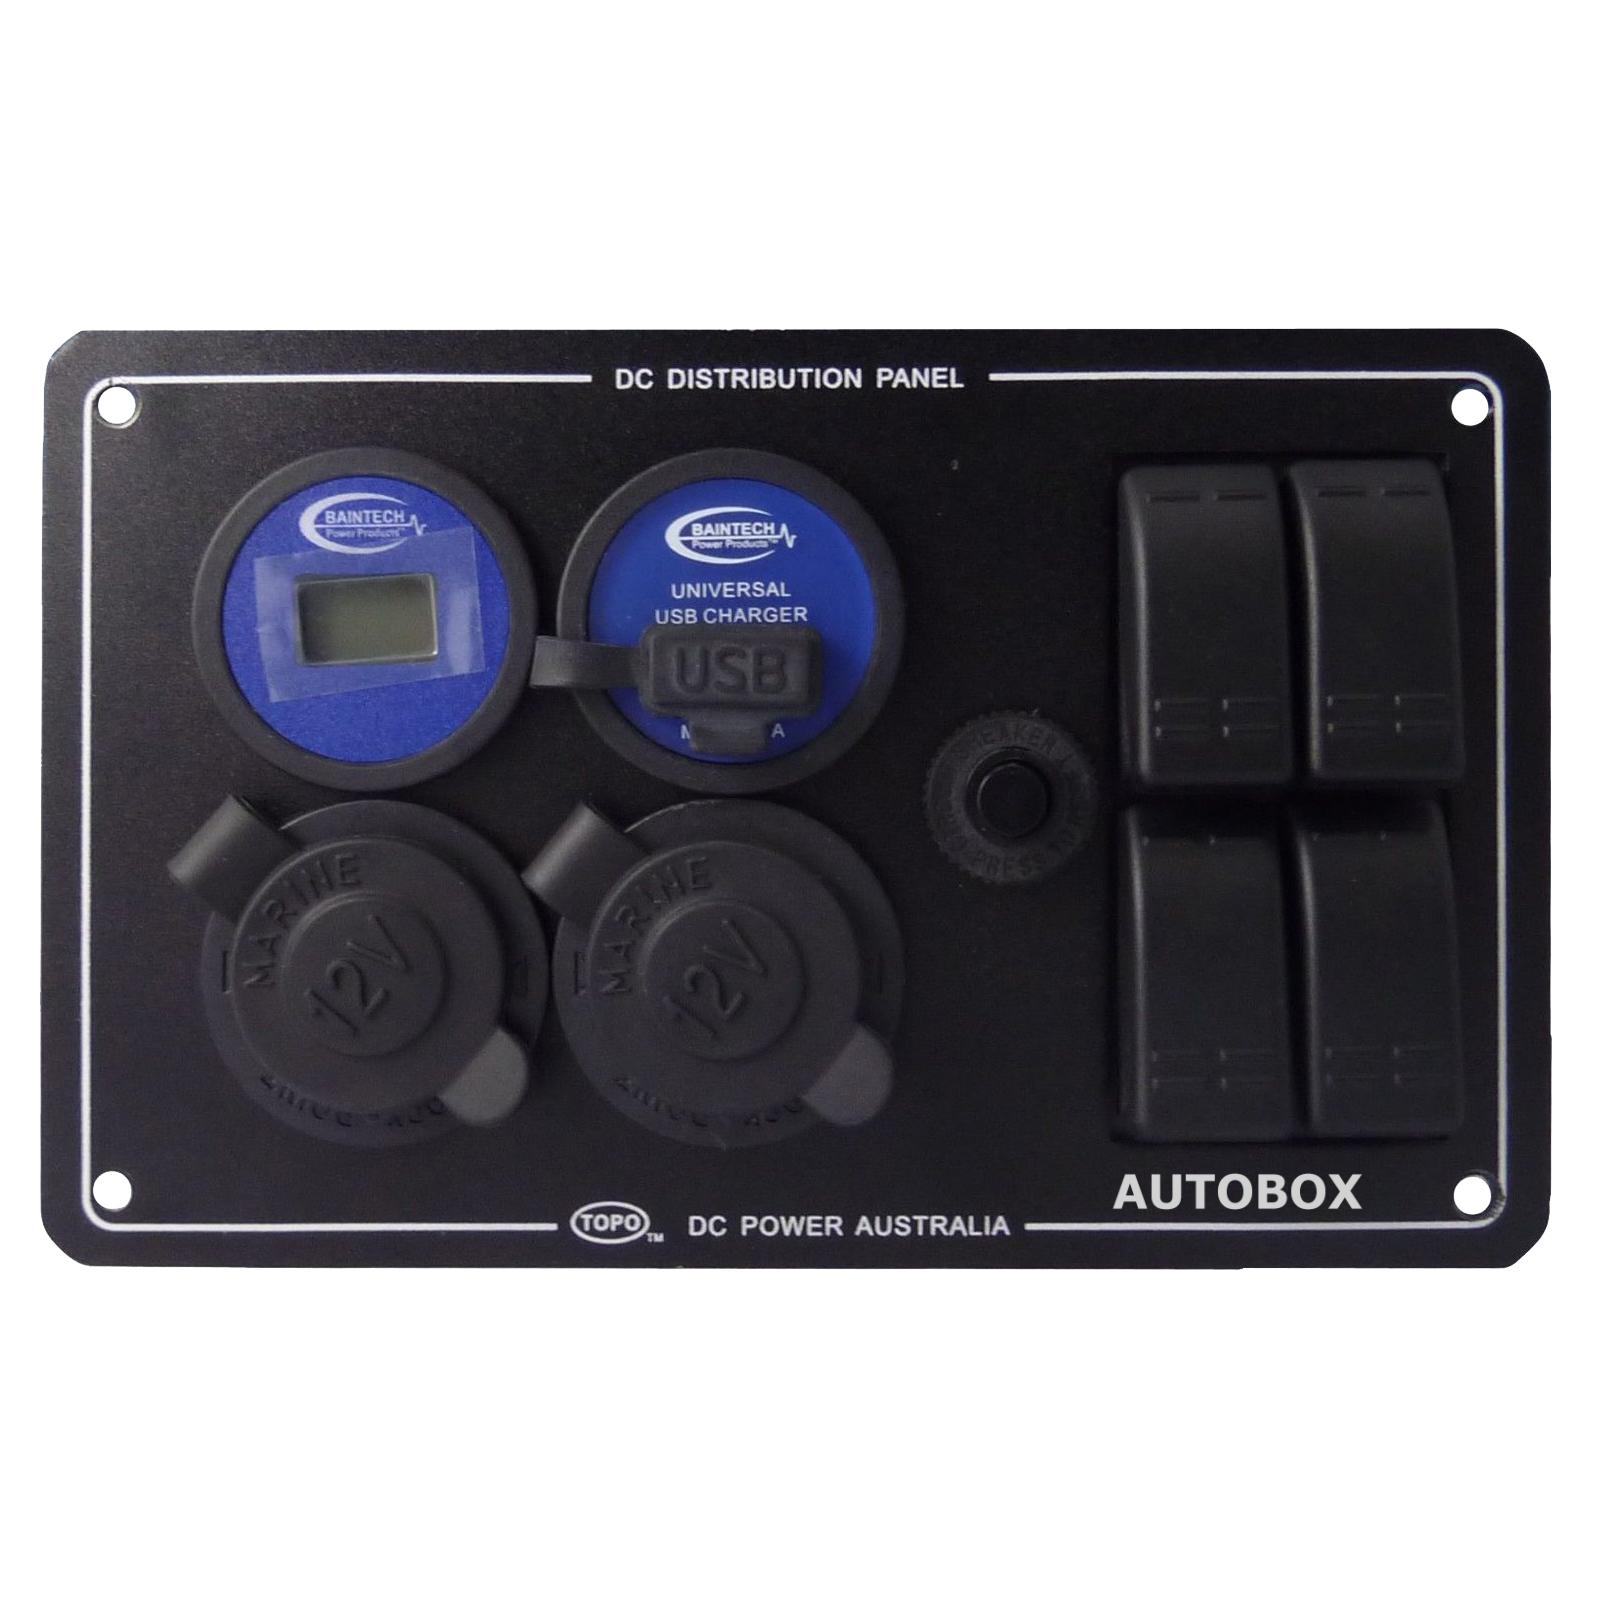 Caravan 12v Distribution Power Panel Voltmeter Usb 2x Ciga